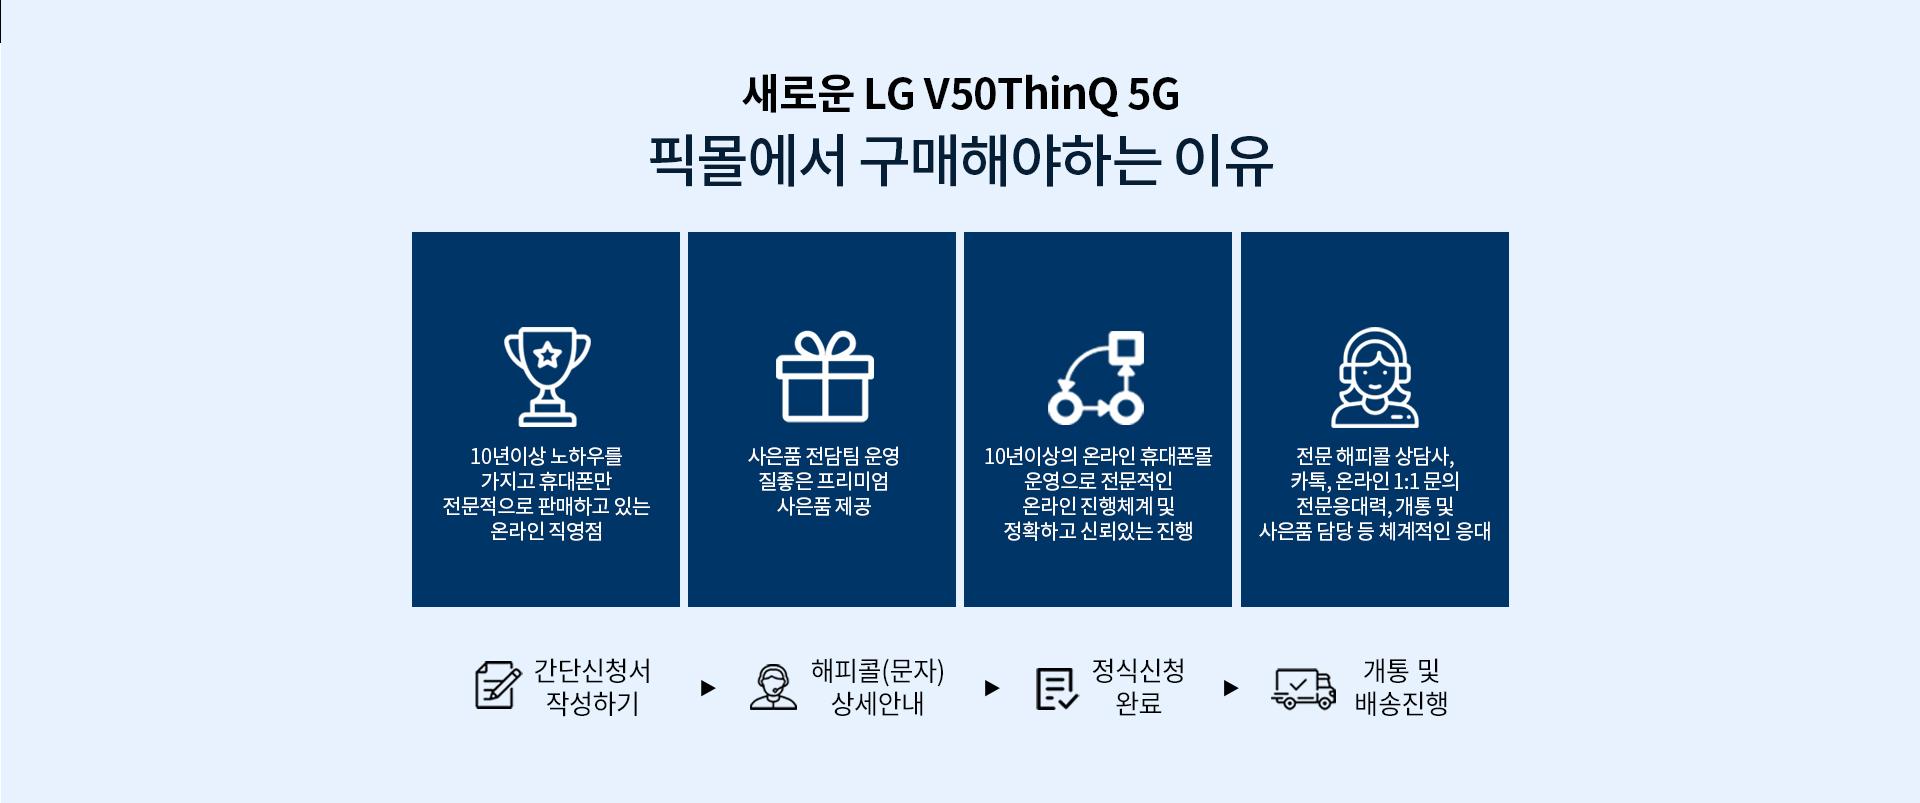 LGV50 엘지V50 V50 픽몰에서 구매해야하는 이유